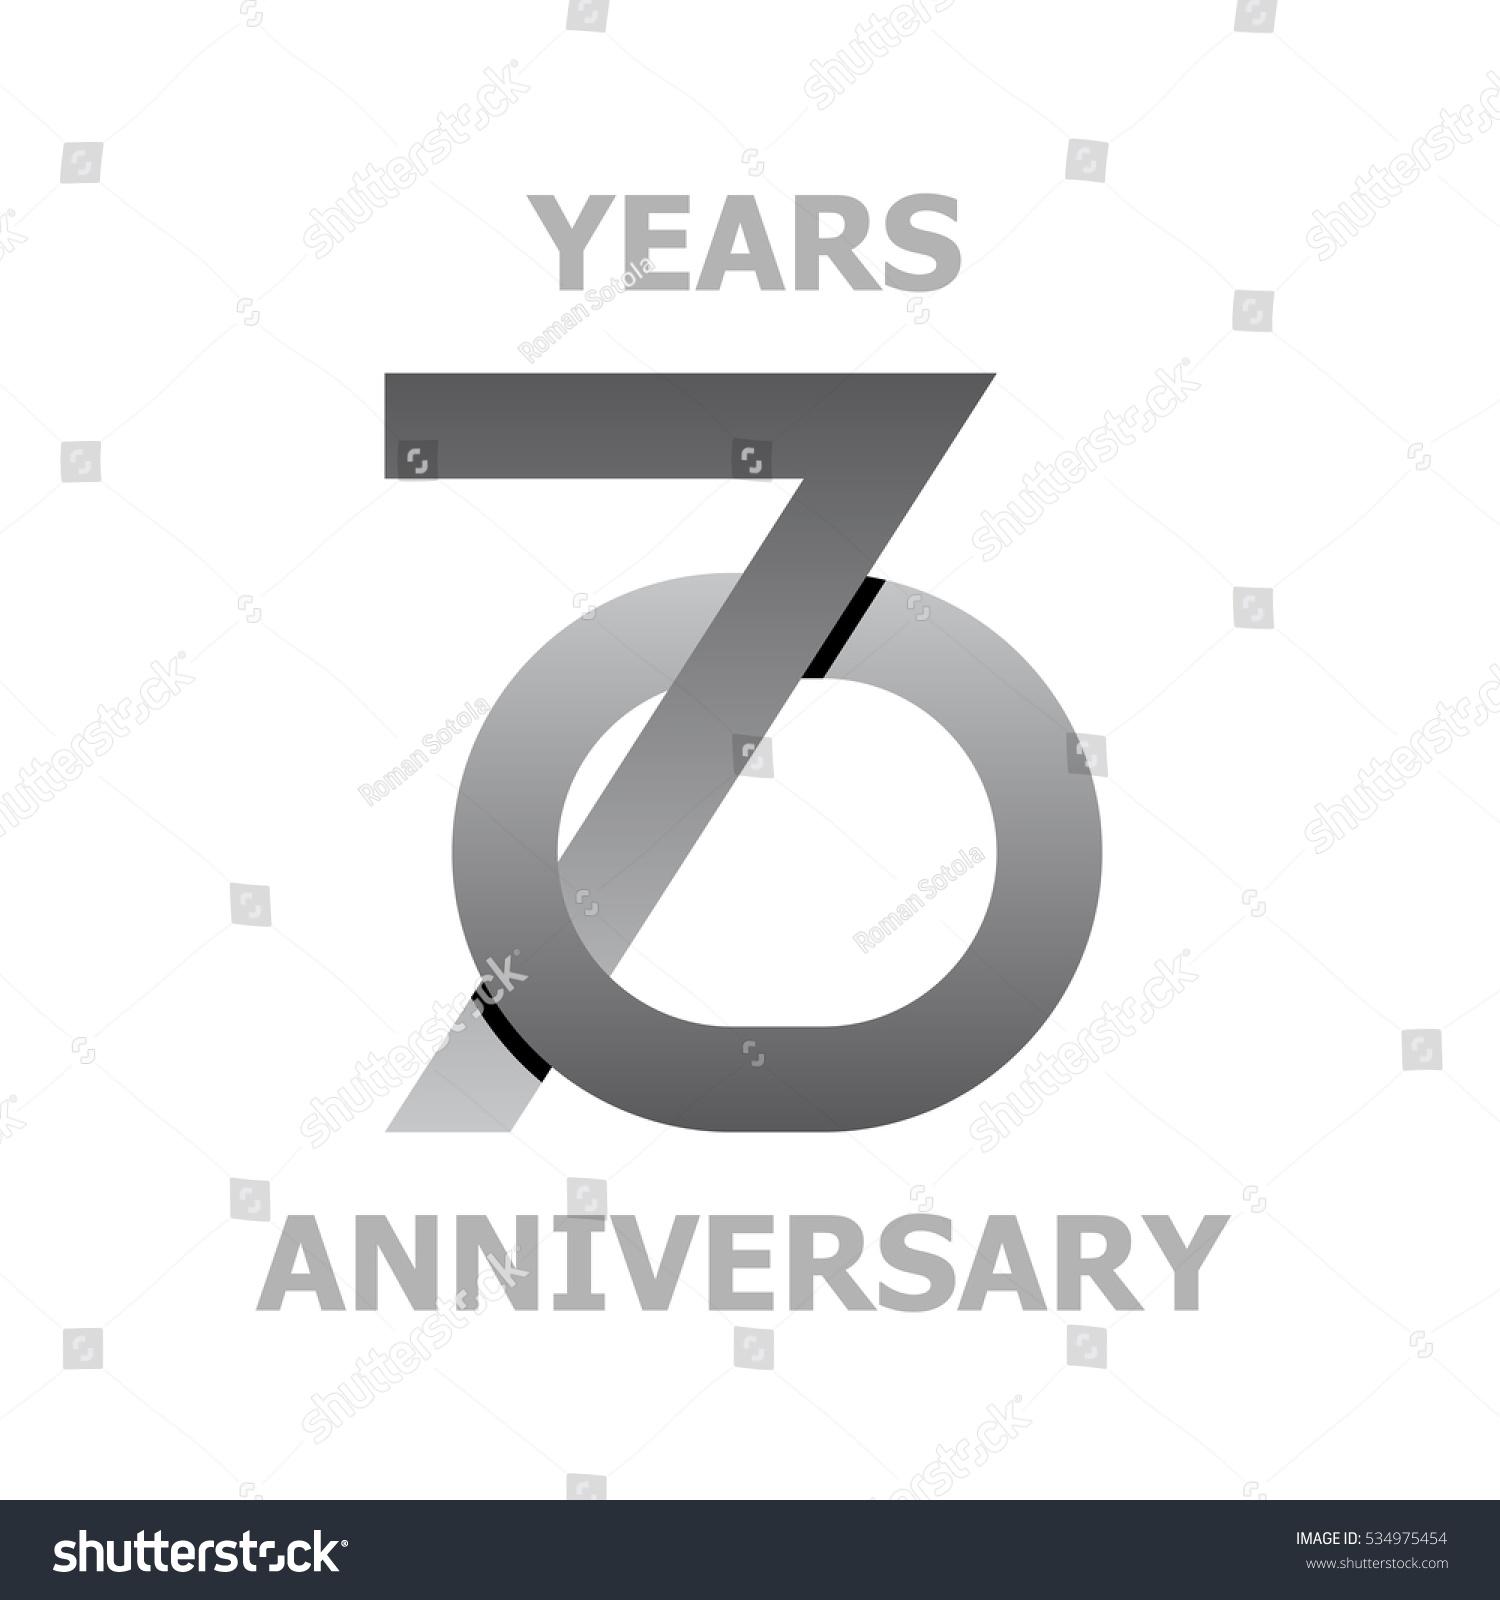 70 Years Anniversary Symbol Vector Stock Vector Royalty Free